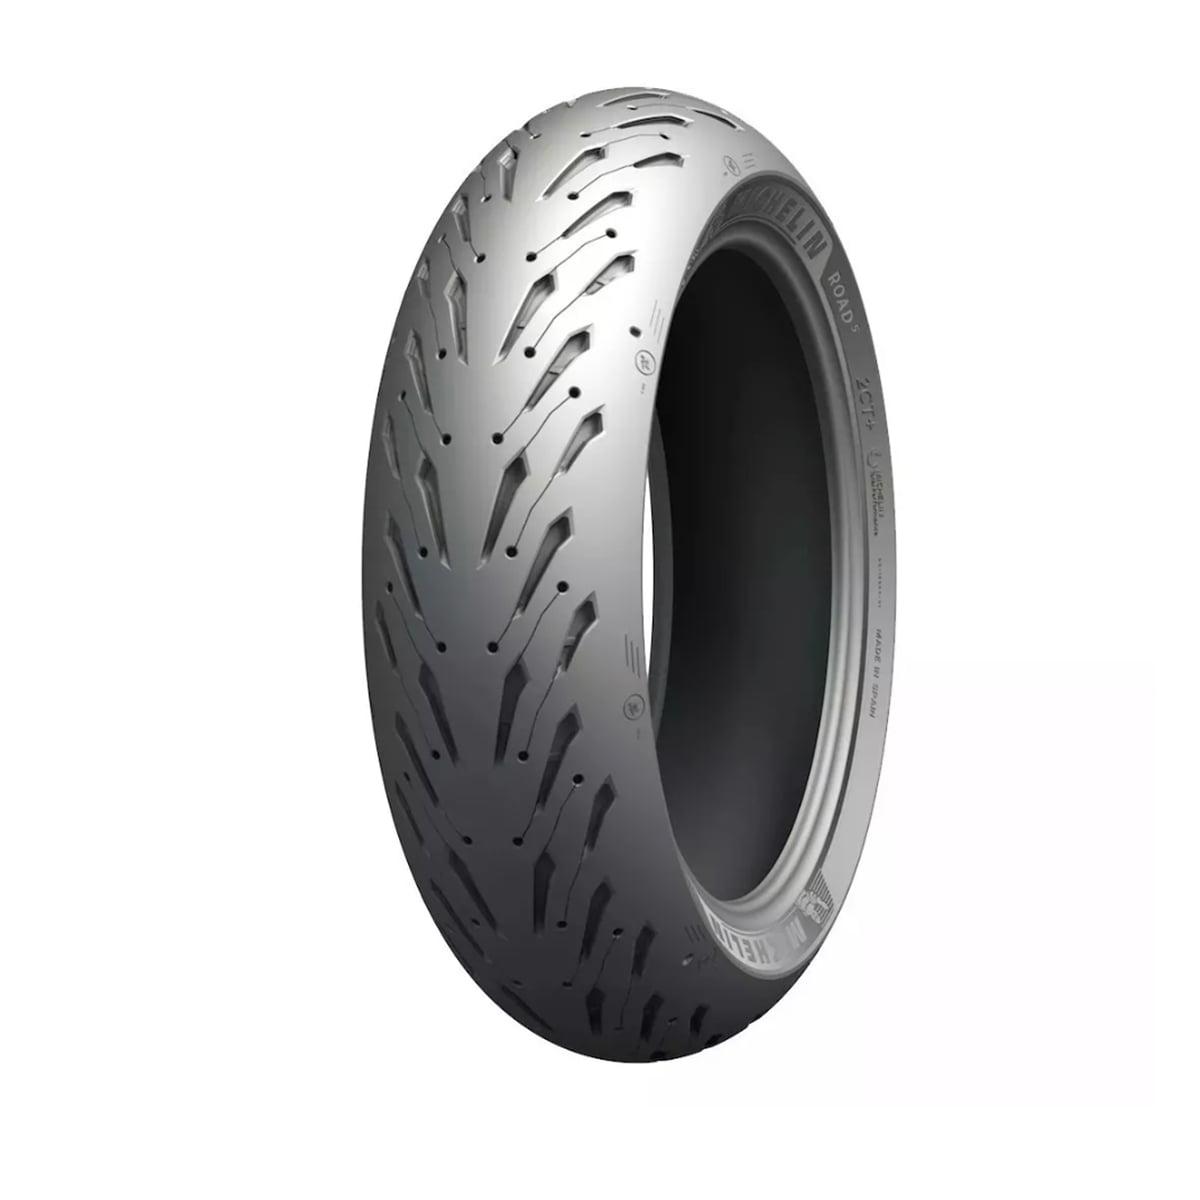 Pneu Moto Michelin 180/55-17 Road 5